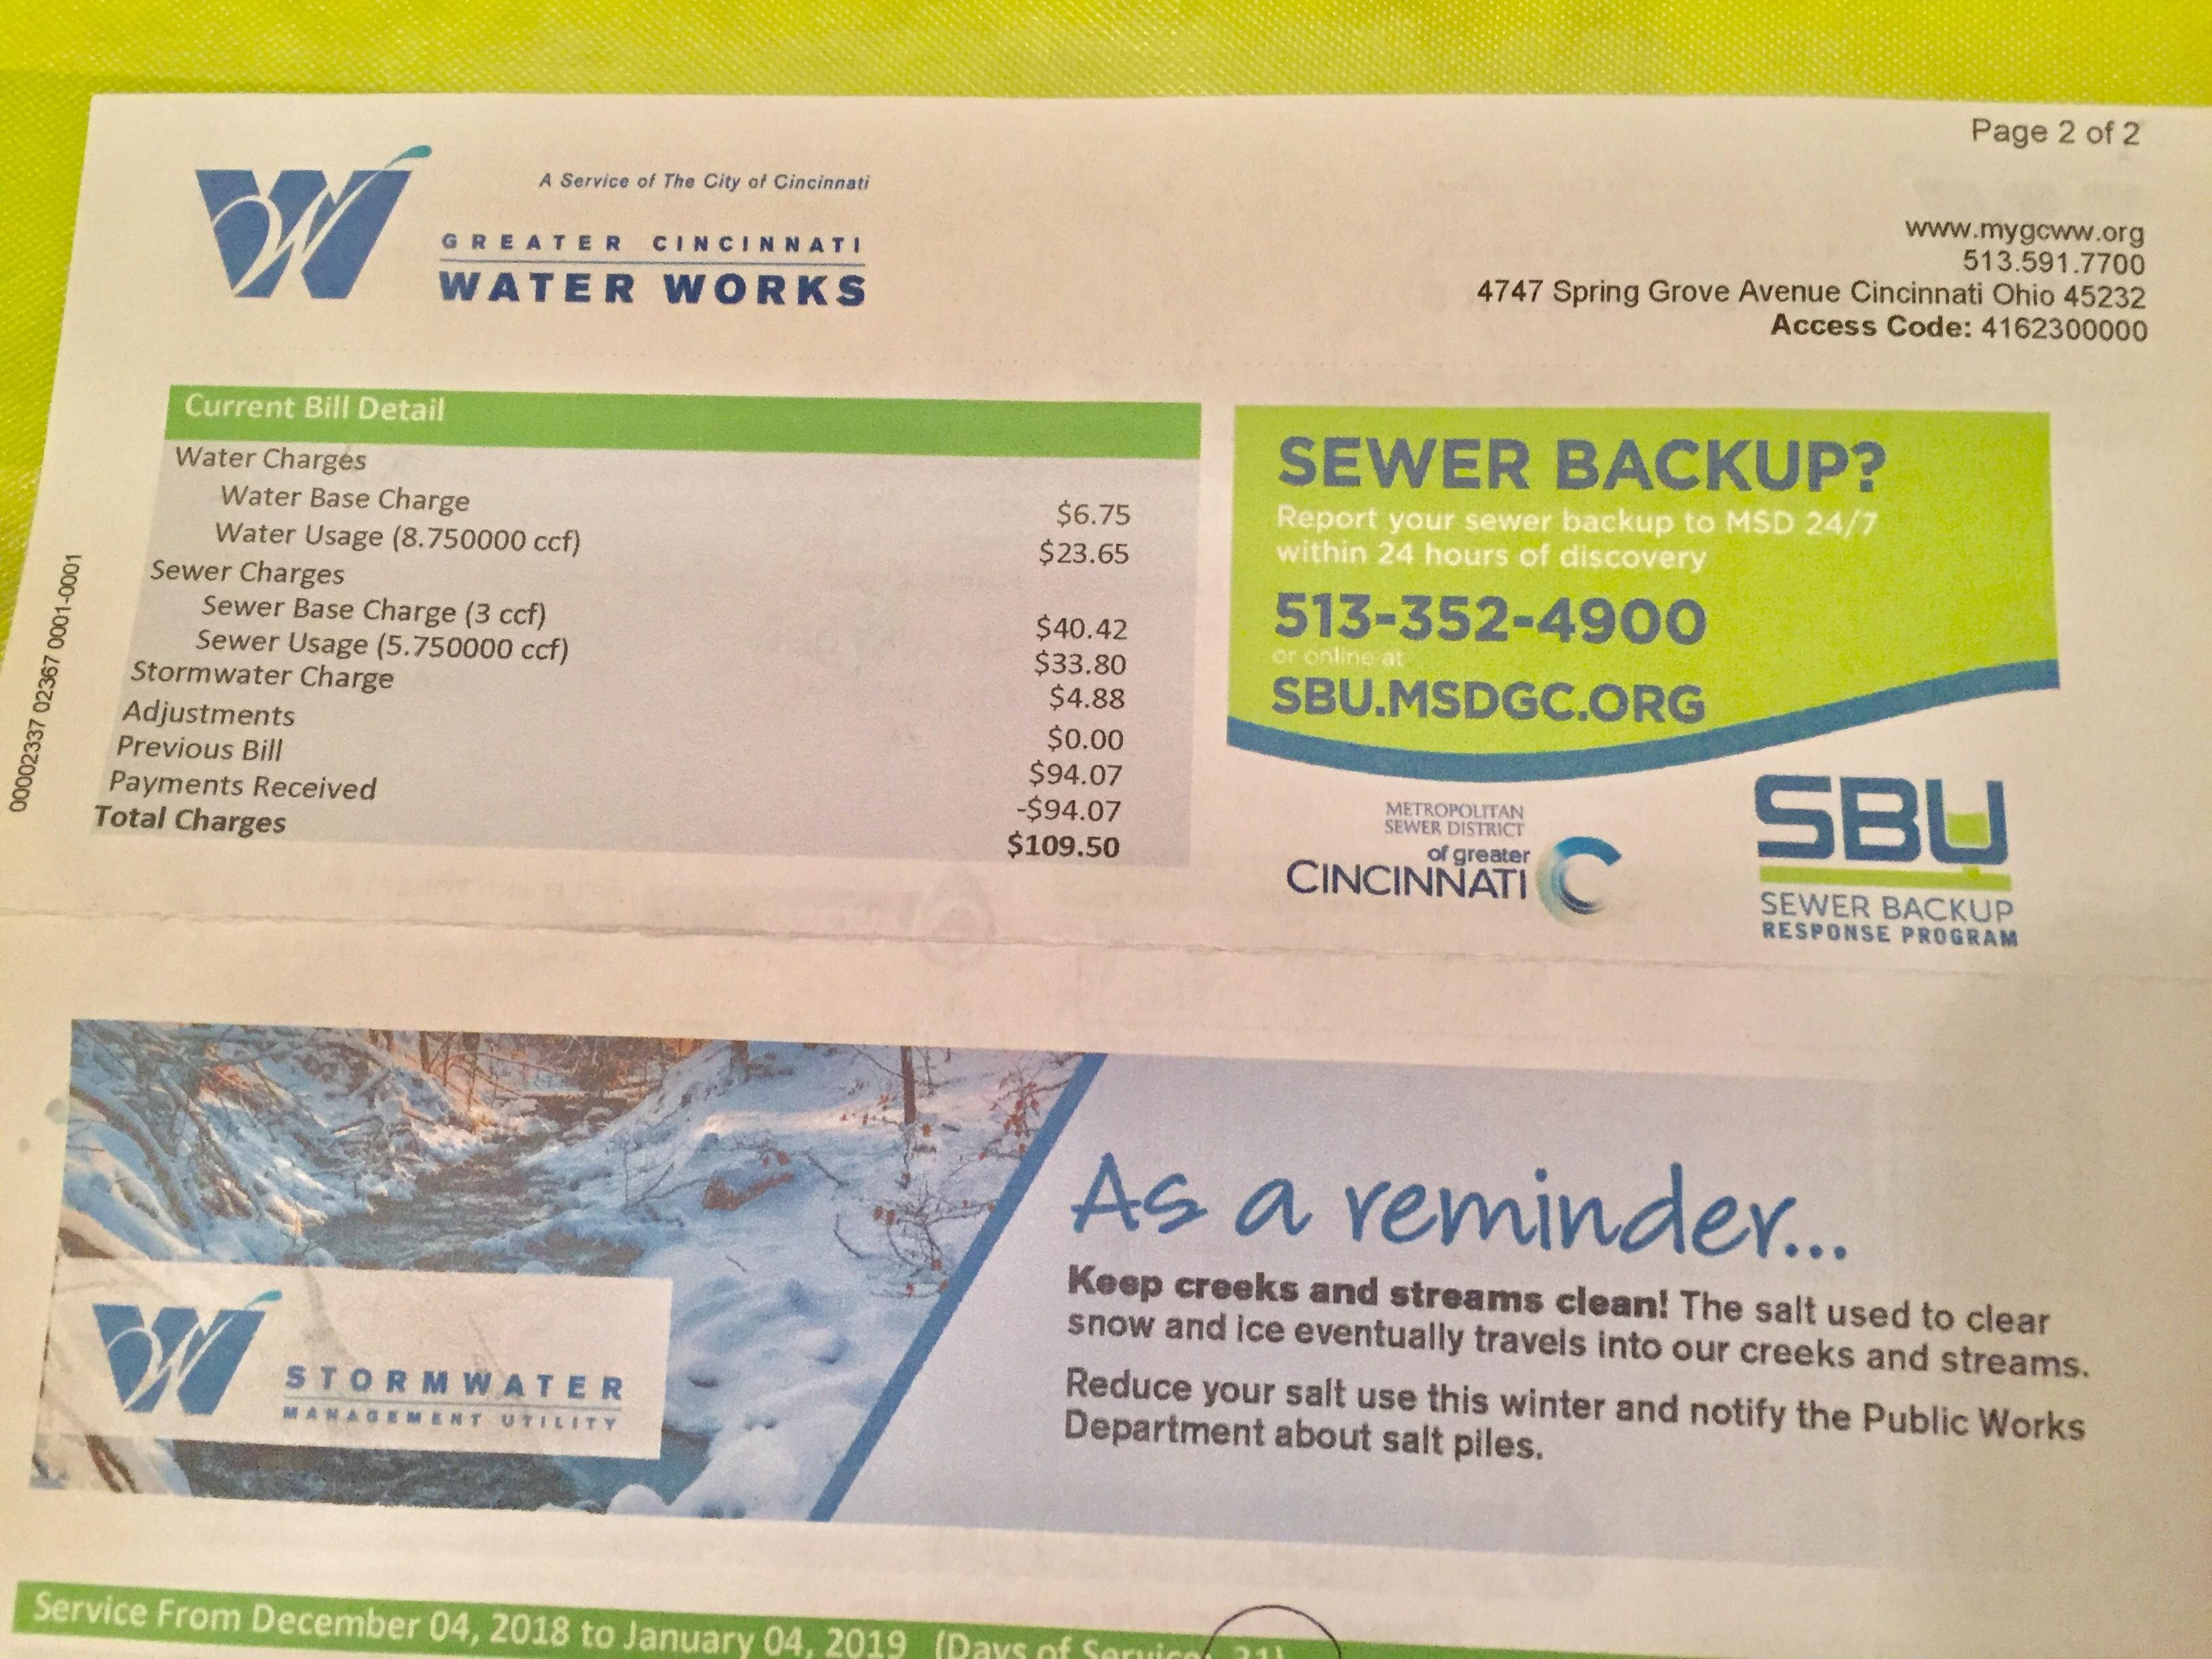 CUFA wins sewer backup program notifications - Communities